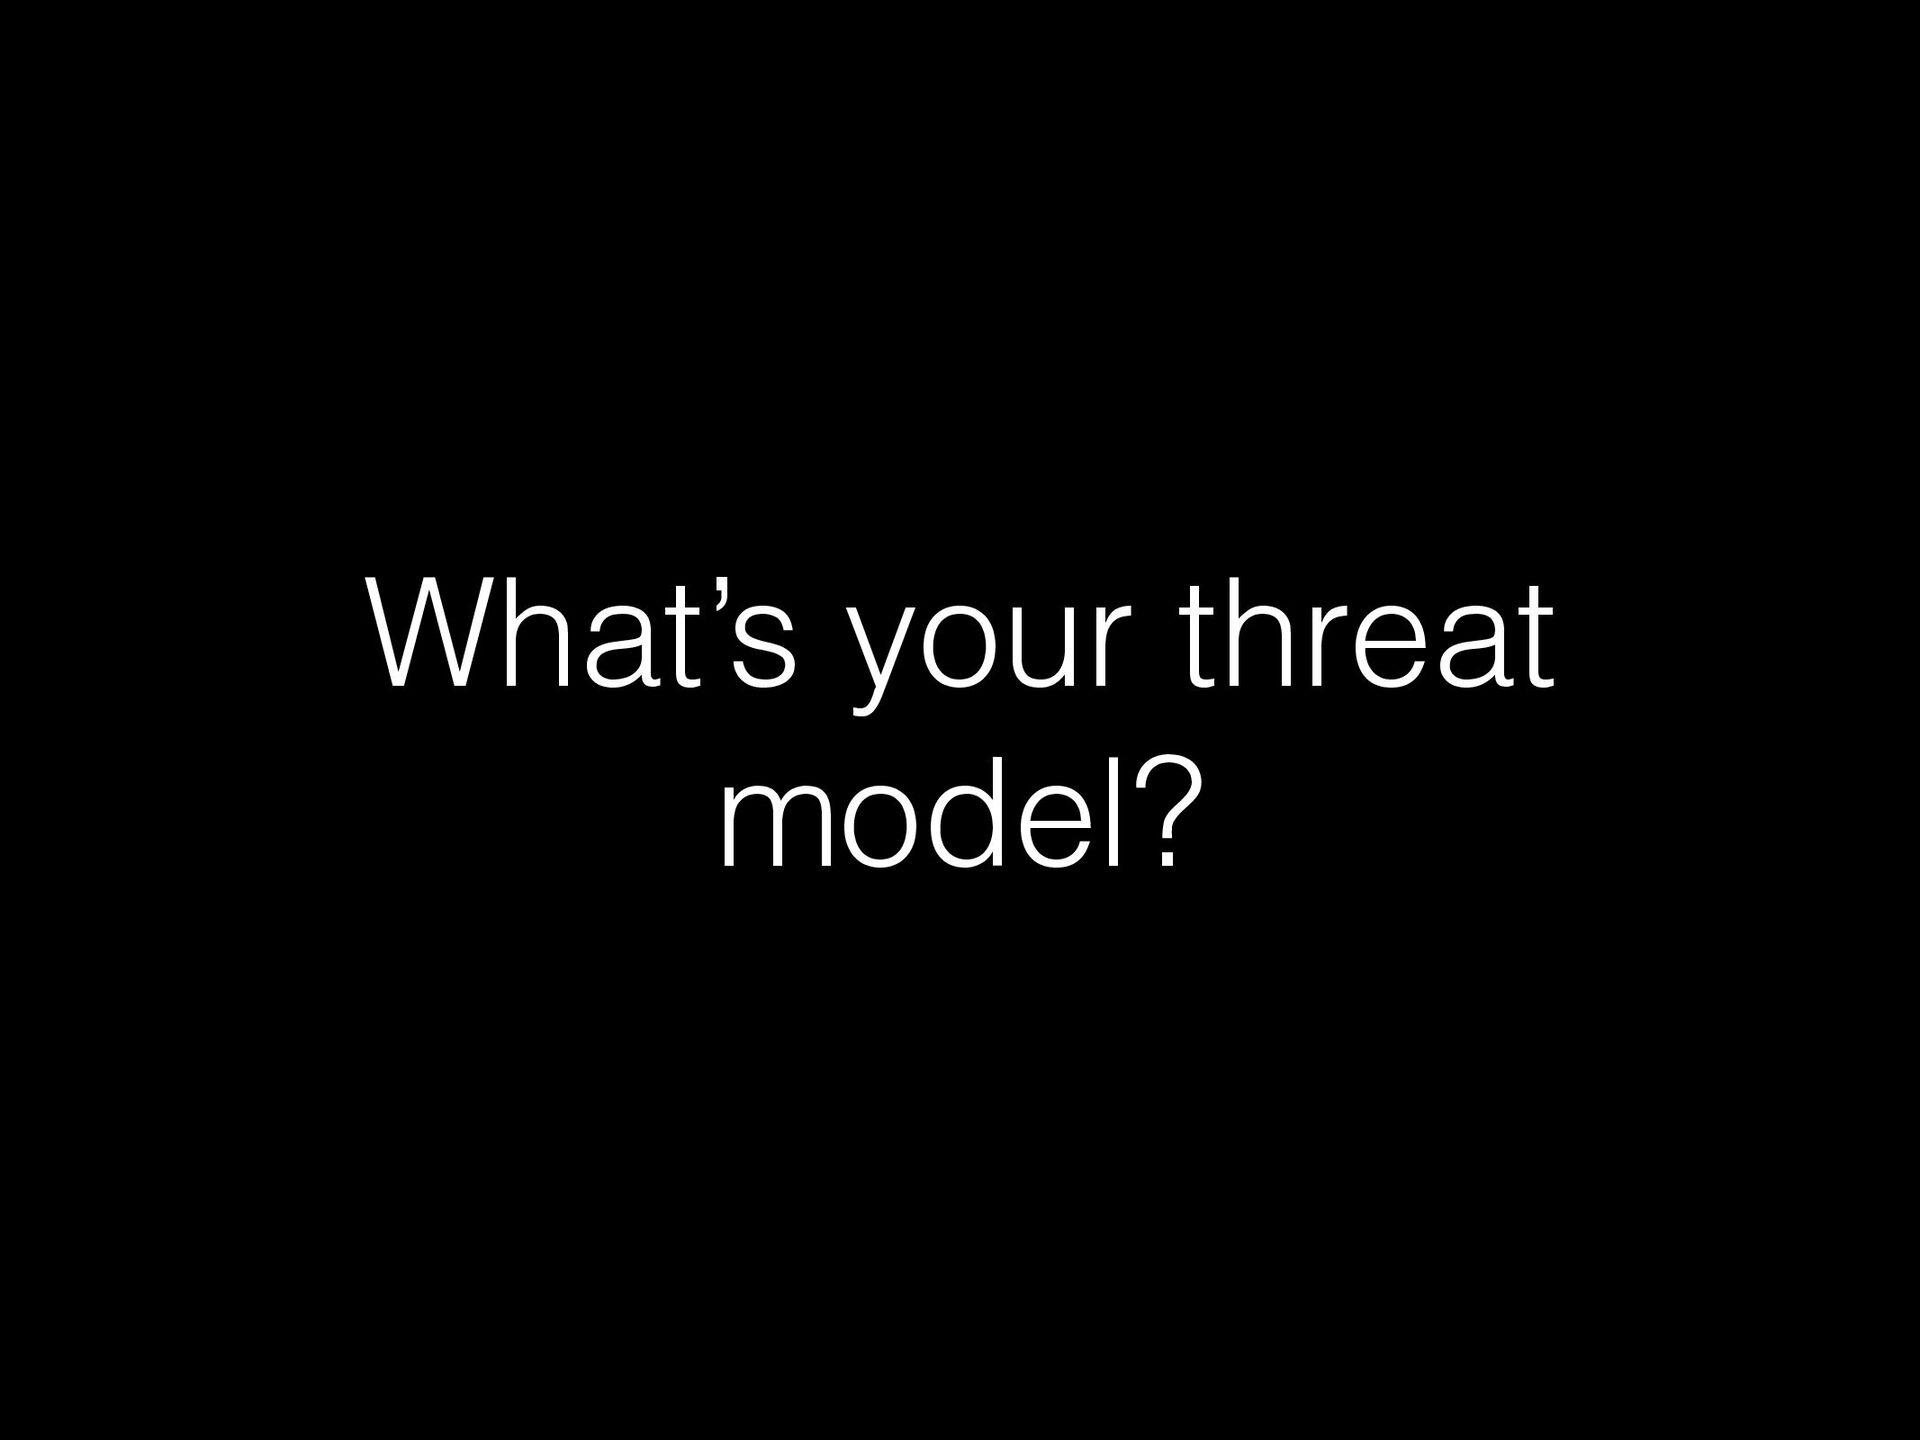 https://www.wired.com/2017/12/digital-security-...